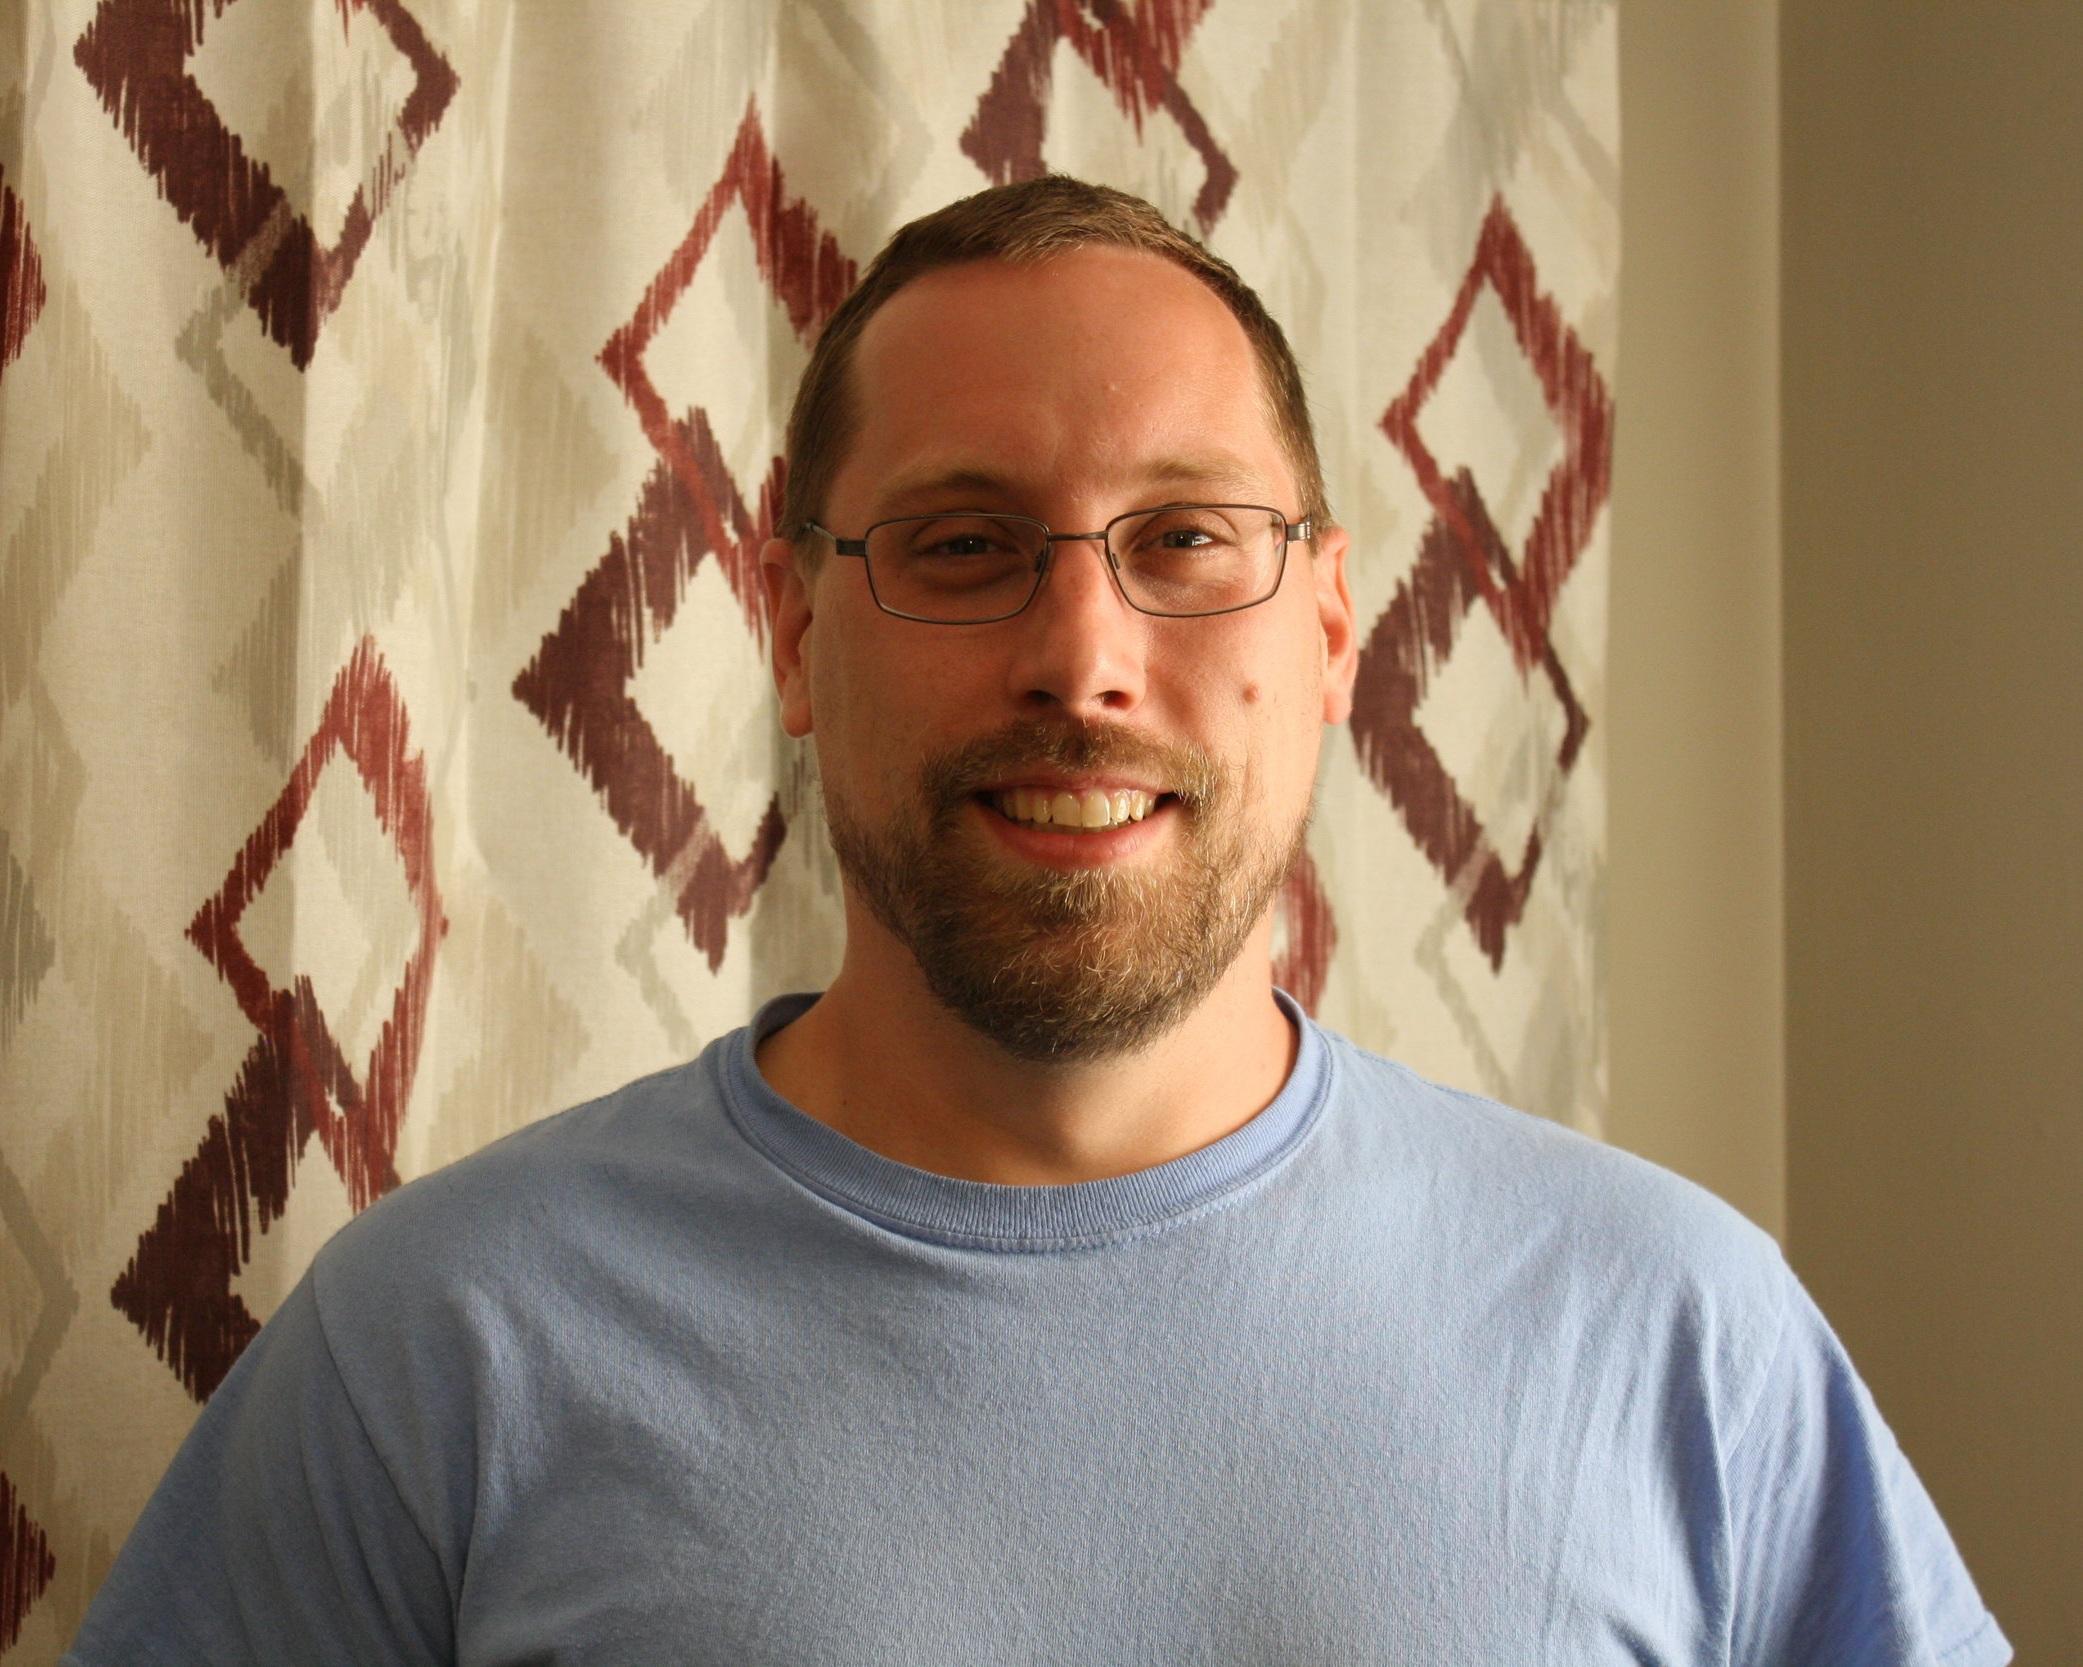 Kevin Harwood - Technical Director/Facilities